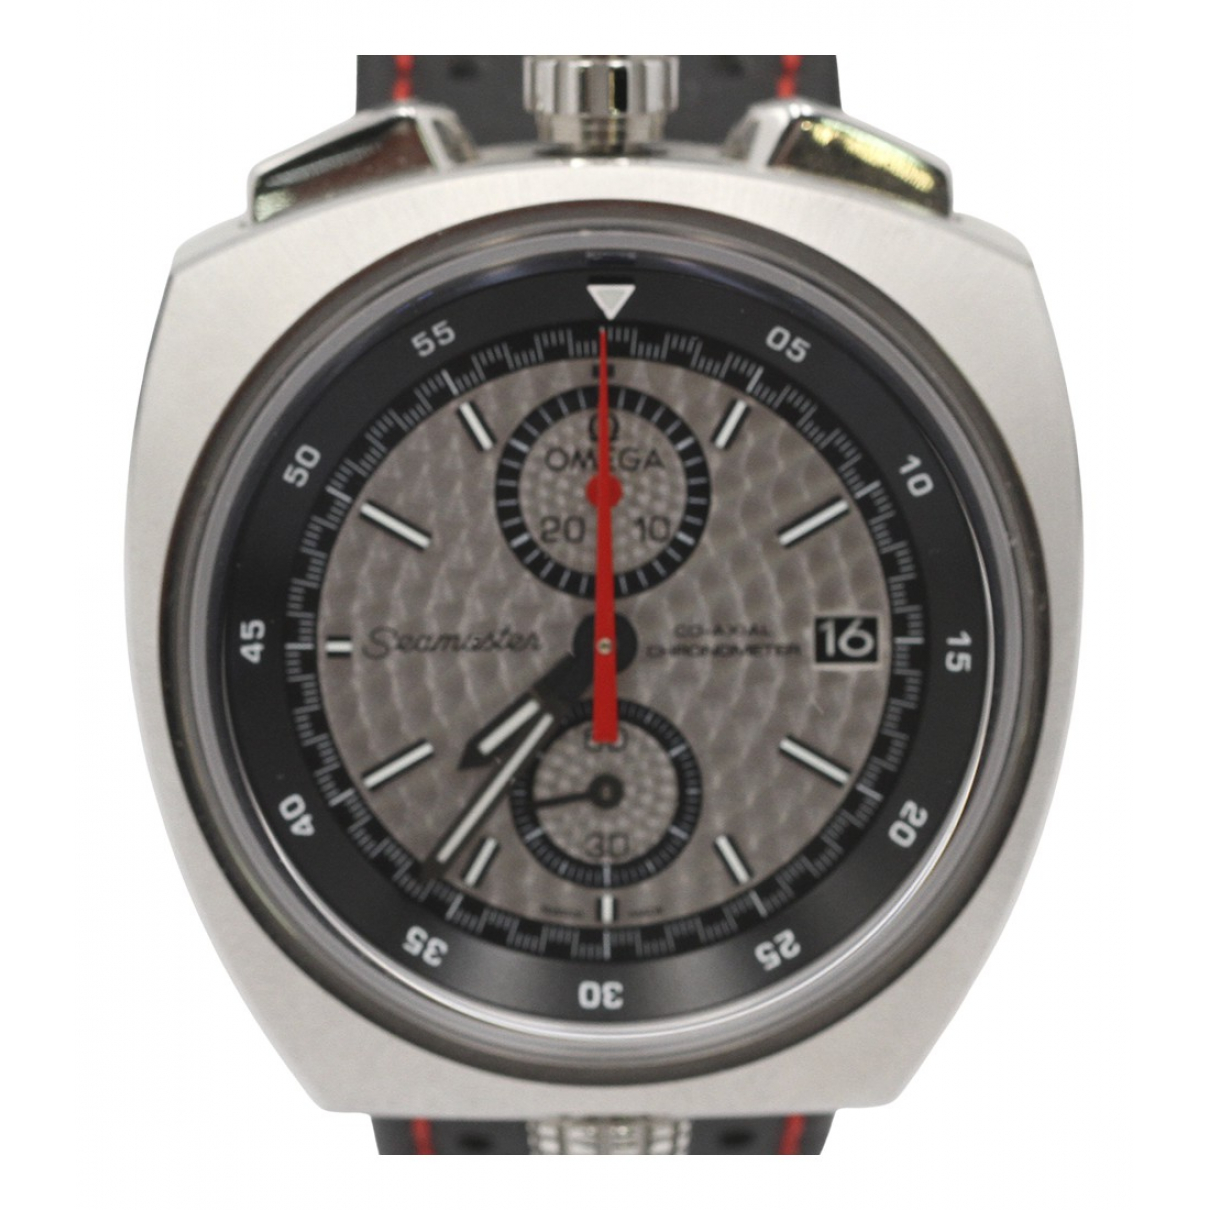 Omega Seamaster Uhr in Stahl